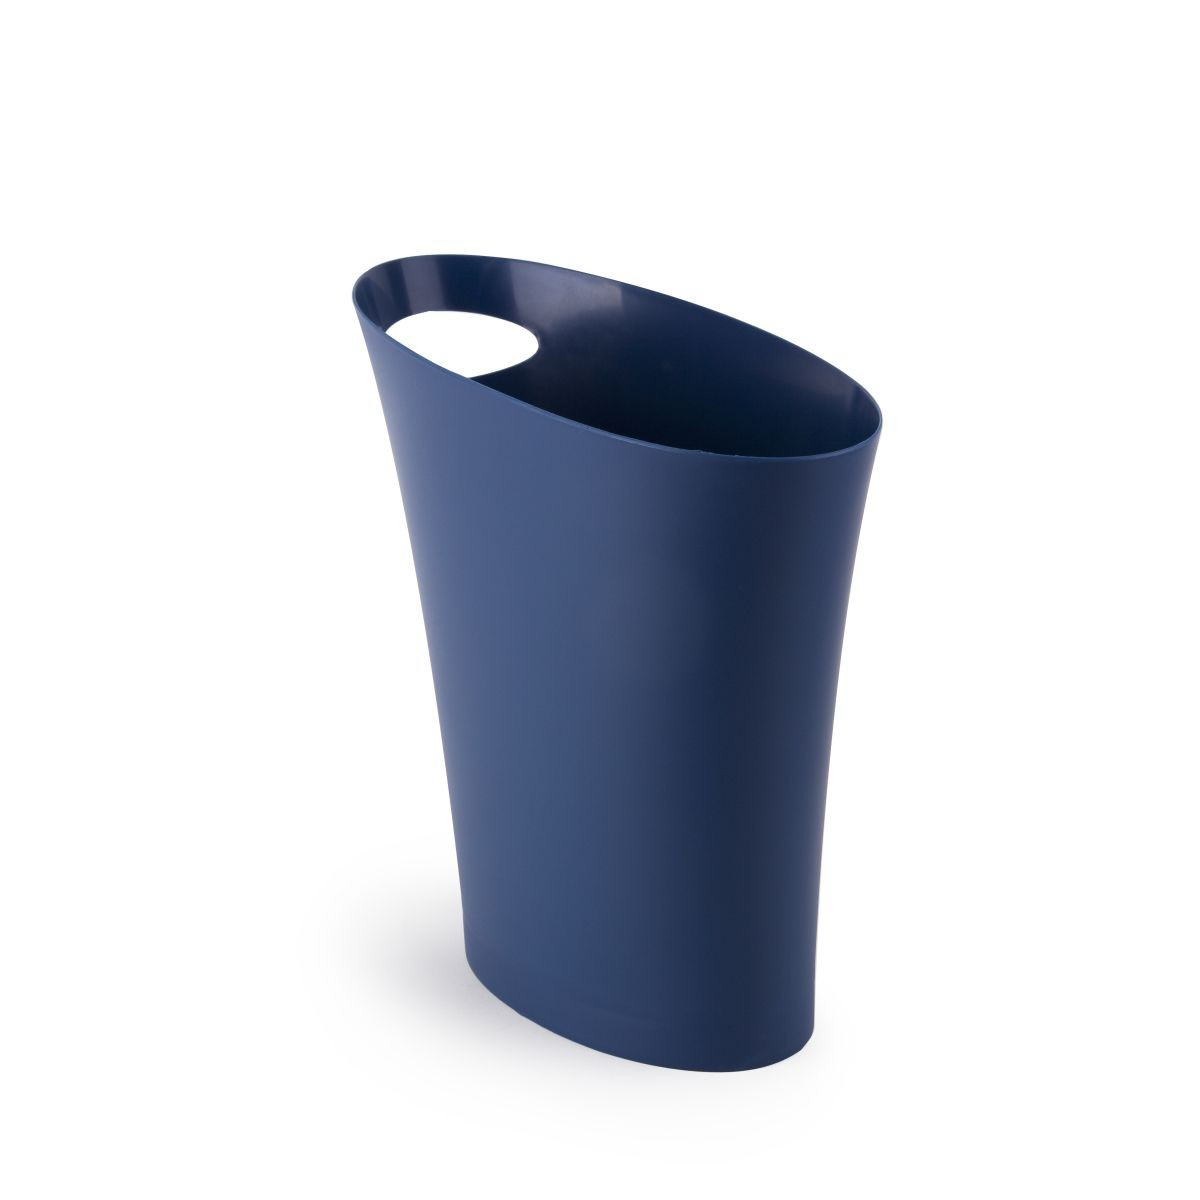 Контейнер для мусора Skinny цвета индиго